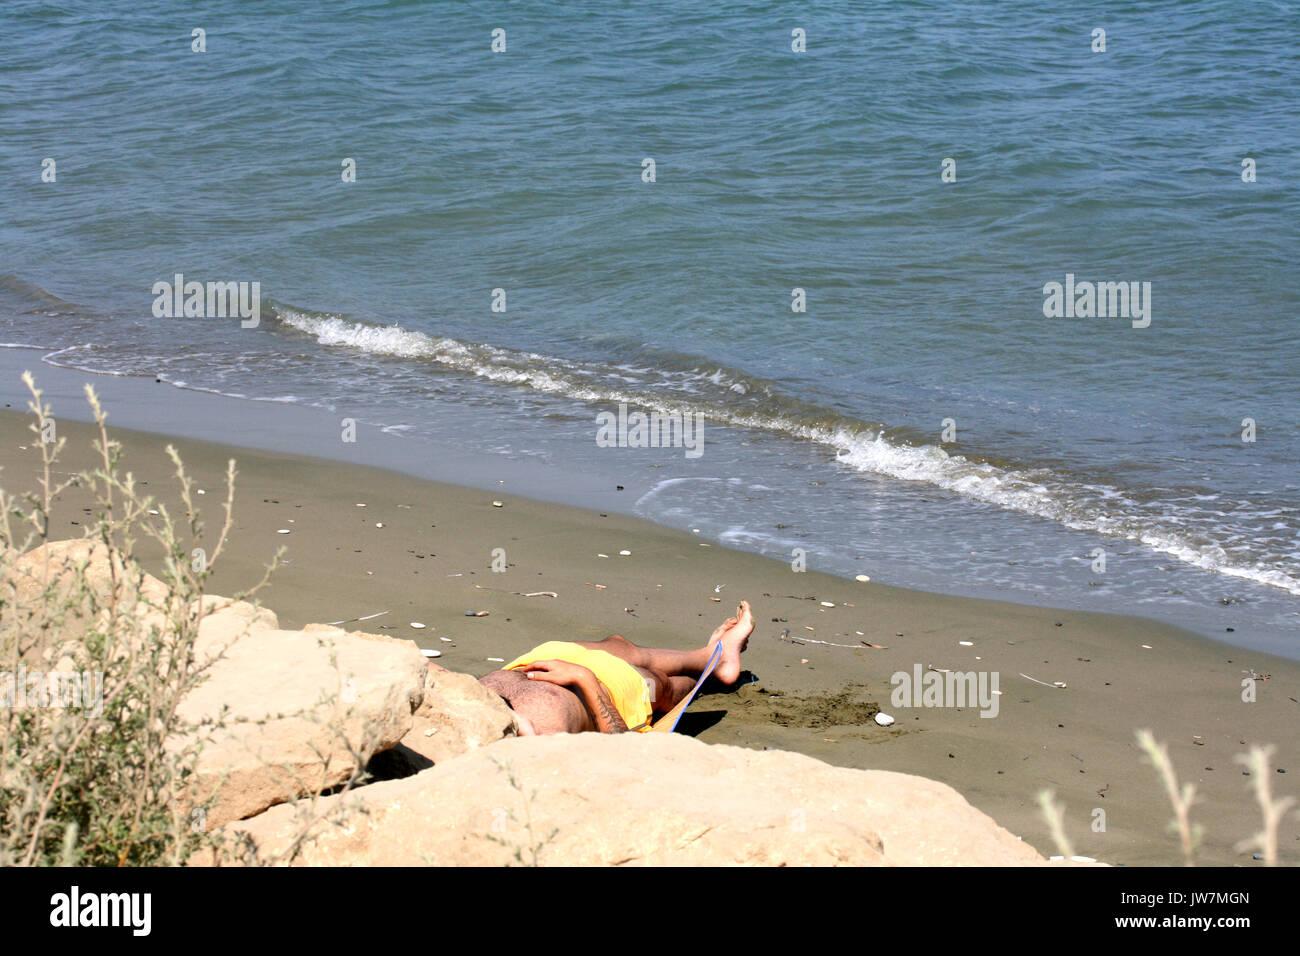 Sunbather on Beach - Stock Image